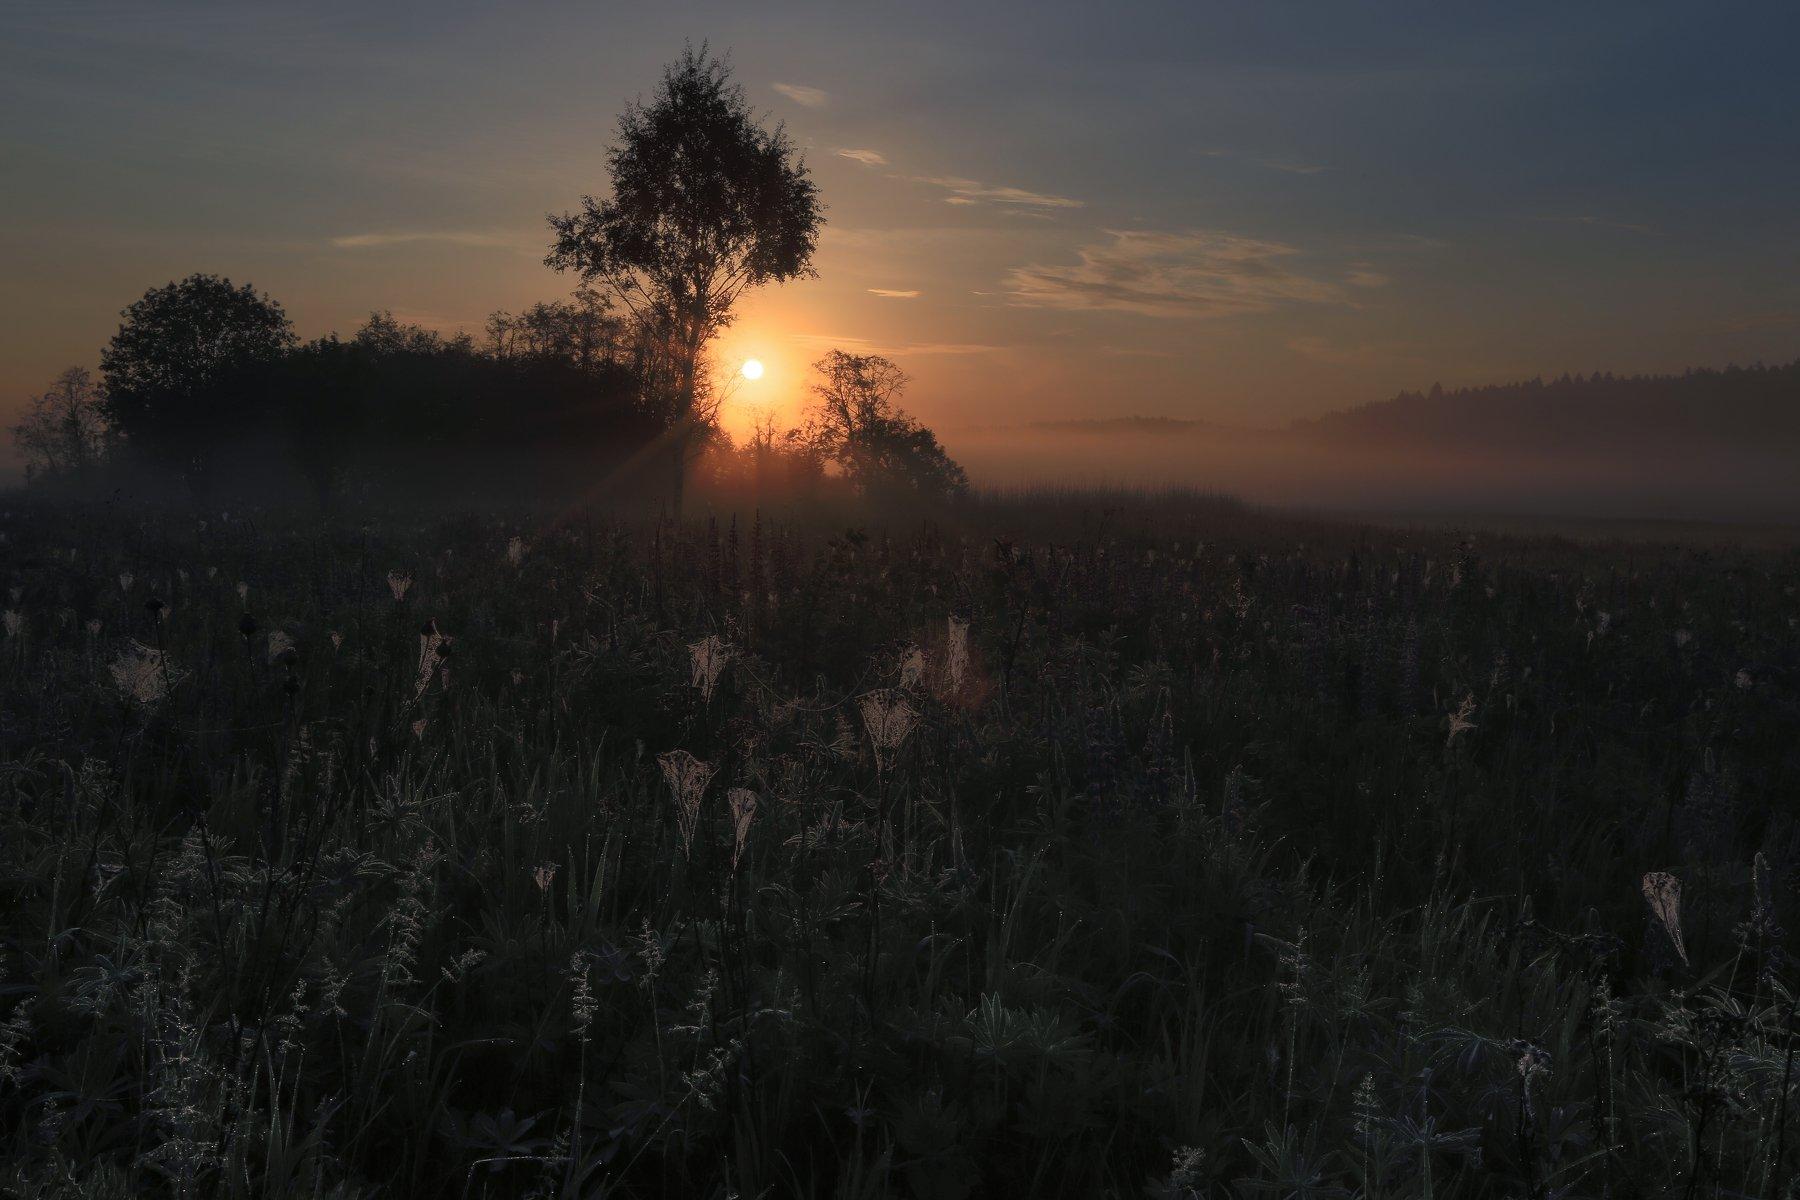 рассвет, восход , солнце,лучи,туман,роса,люпины,паутина, Ирина Назарова